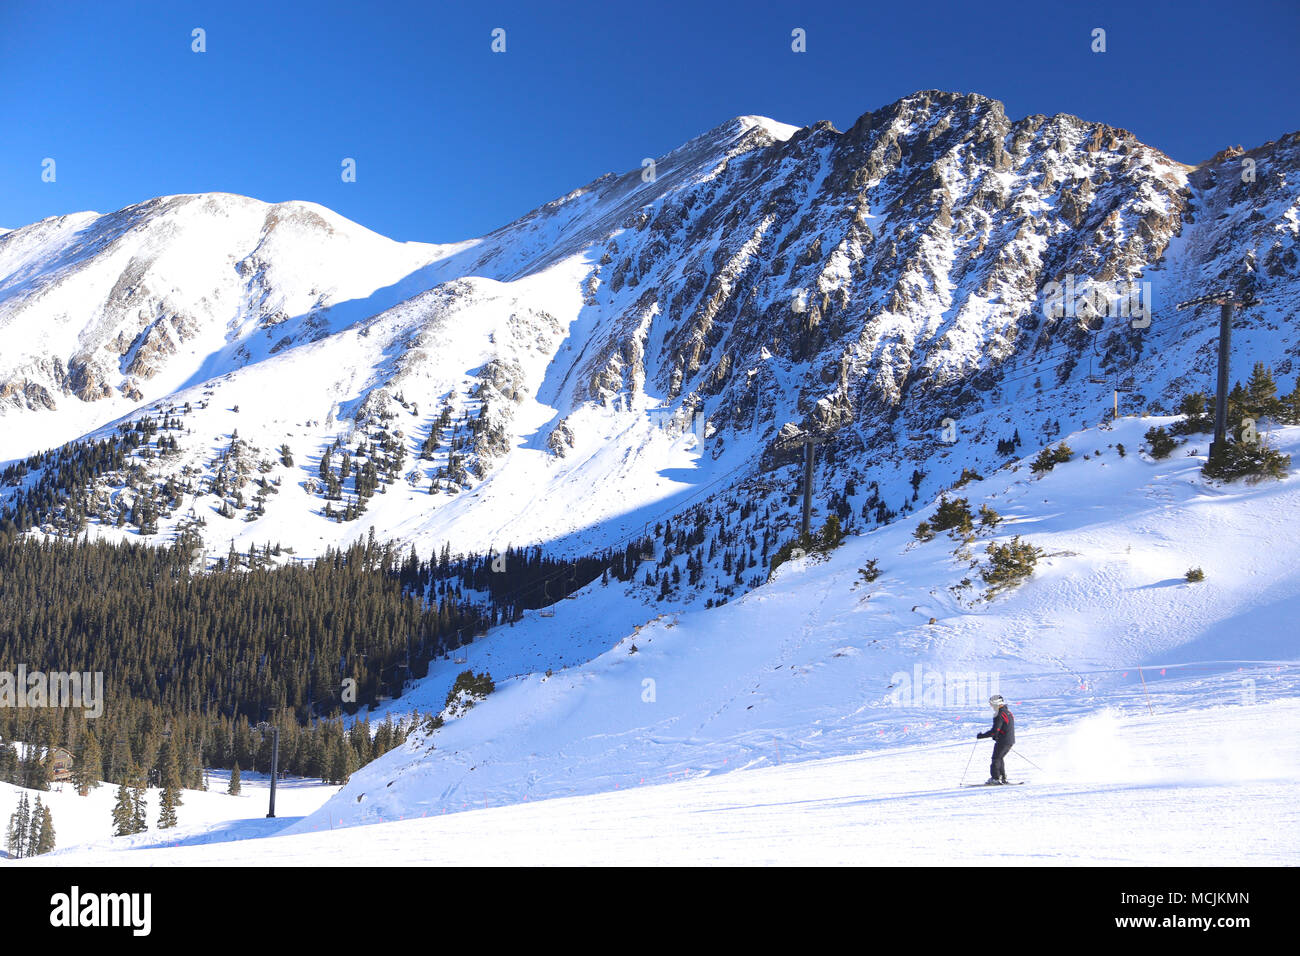 Skier at Arapahoe Basin ski resort in the Colorado Rocky Mountains - Stock Image